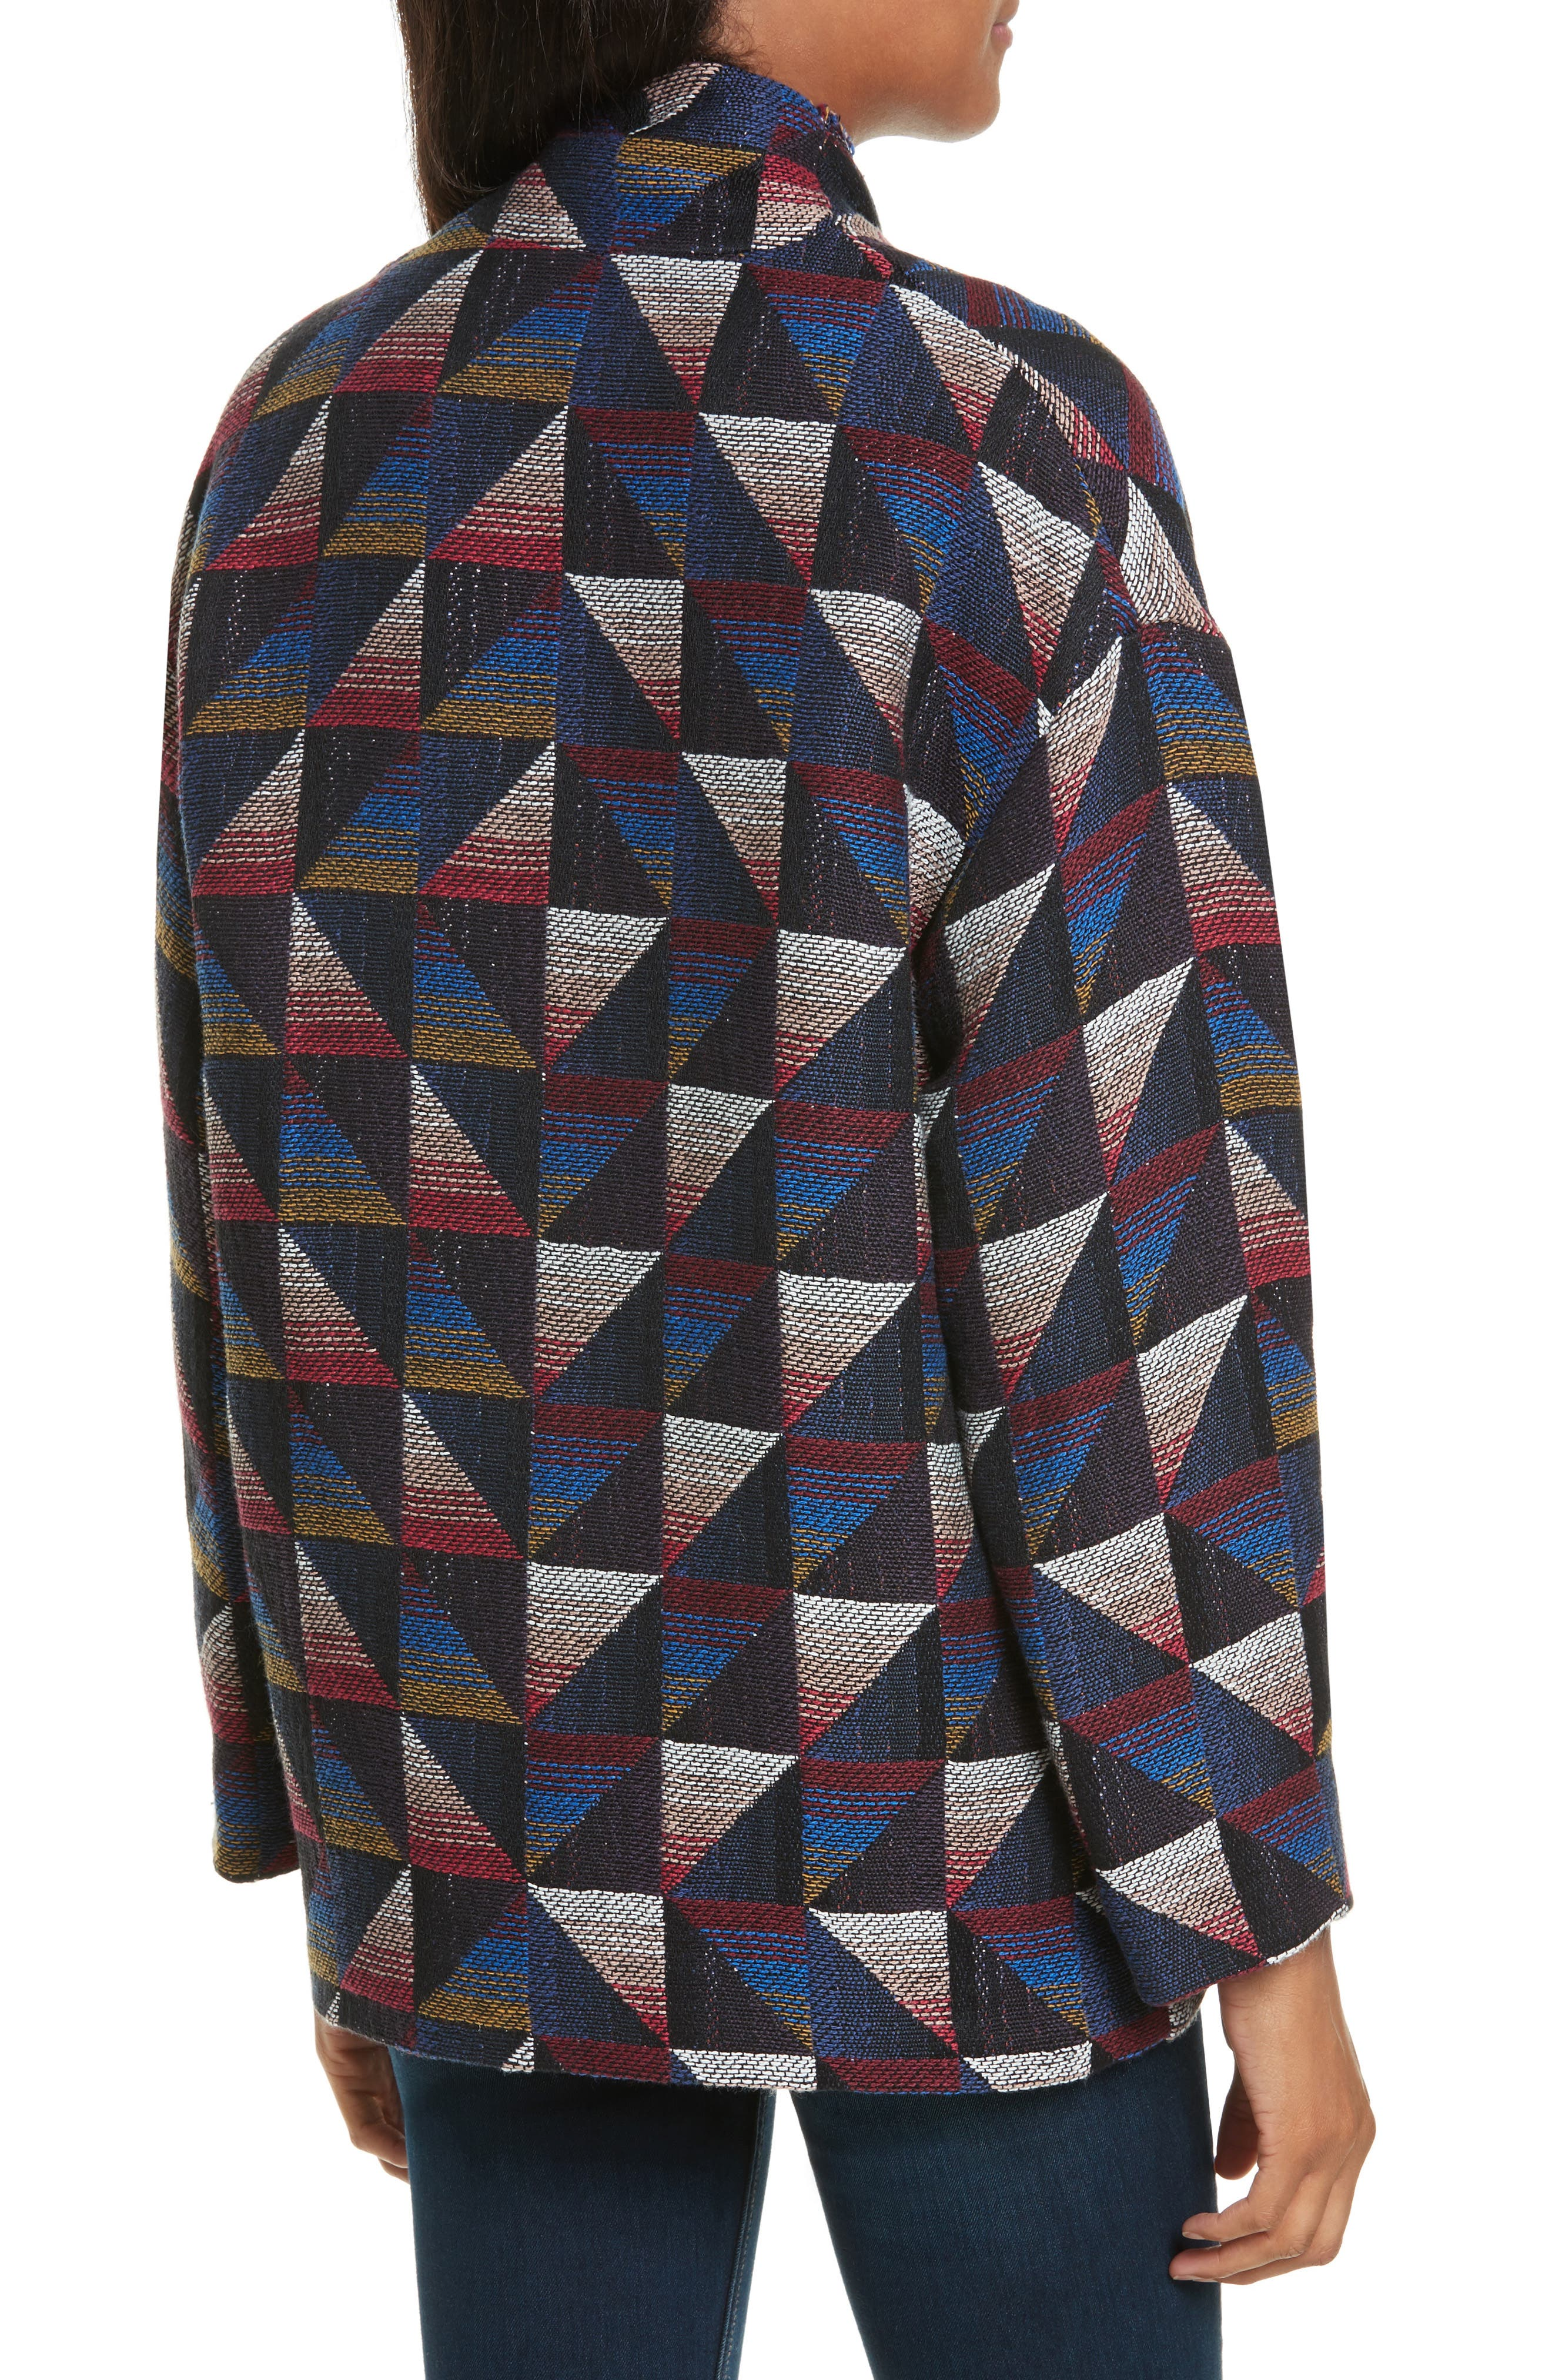 Malhi Cotton Blend Jacket,                             Alternate thumbnail 2, color,                             650